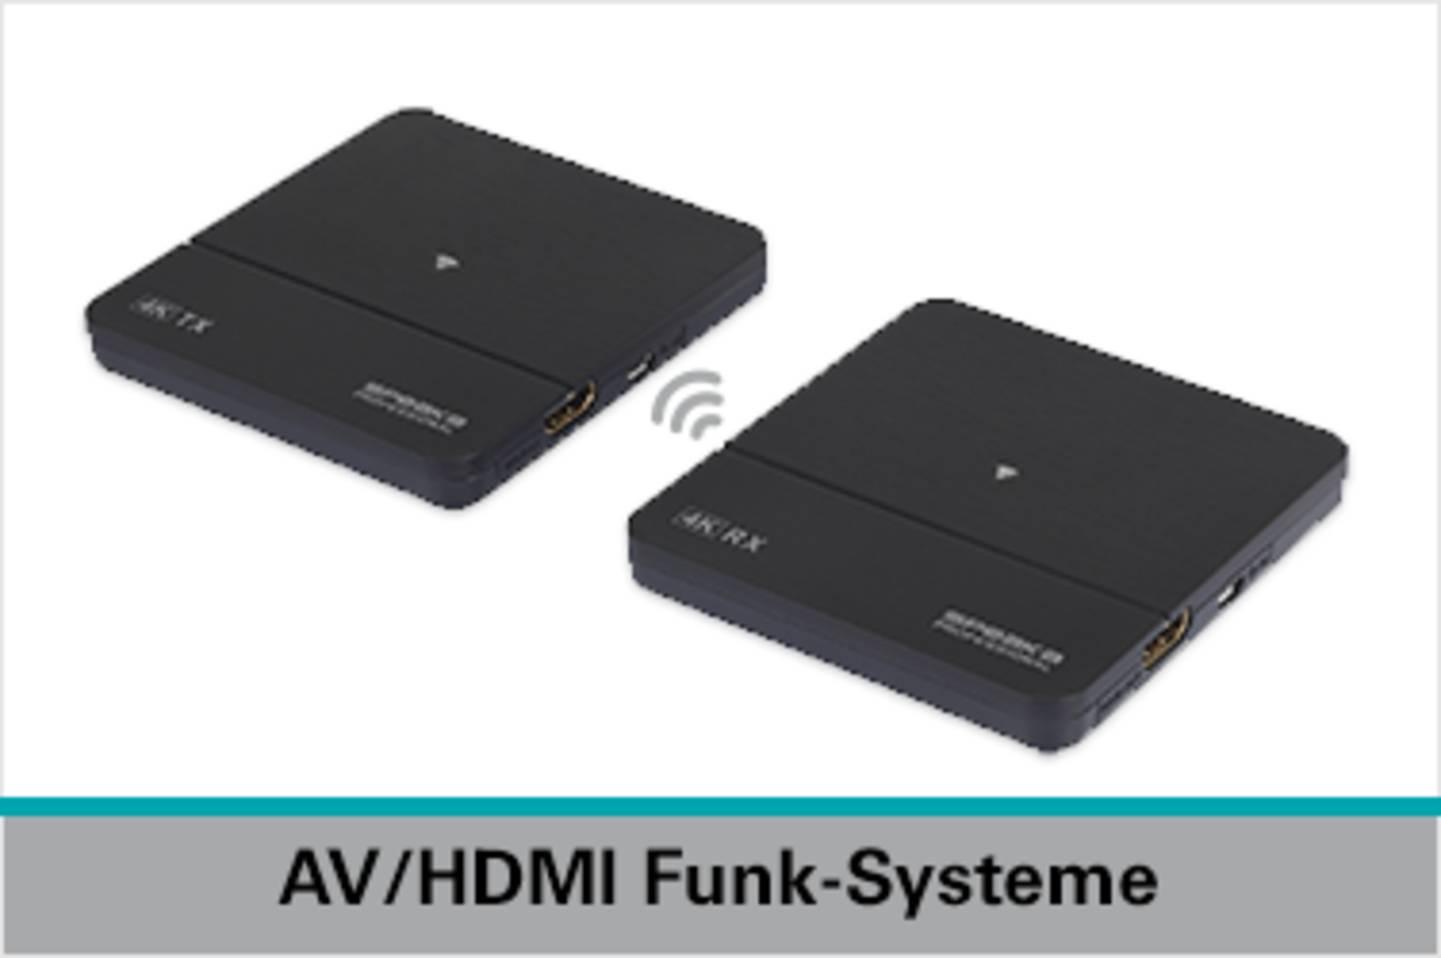 Speaka Professional AV / HDMI Funk-Systeme